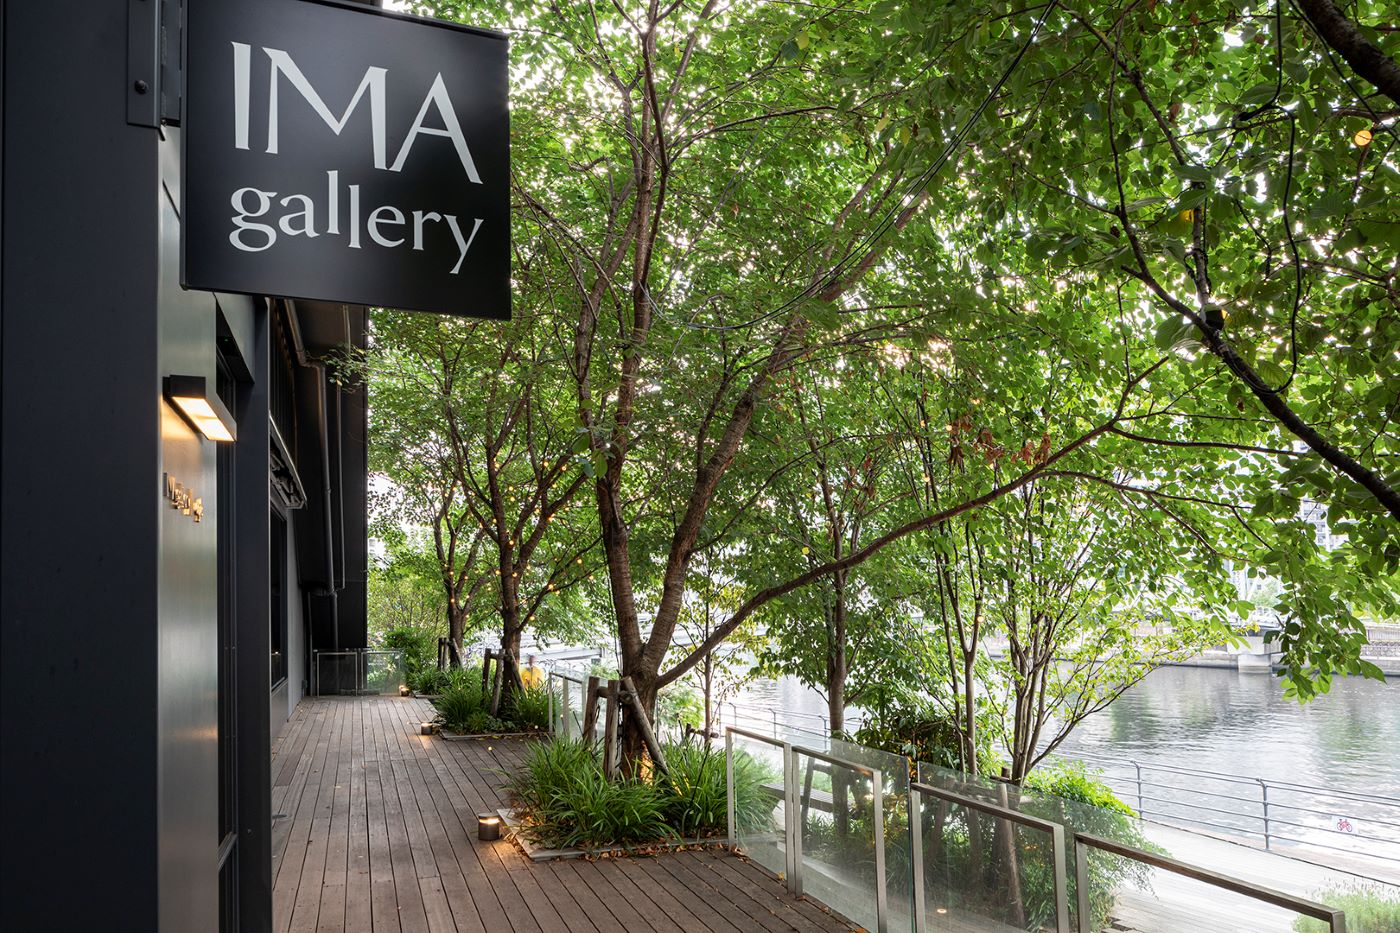 IMA gallery | cafe